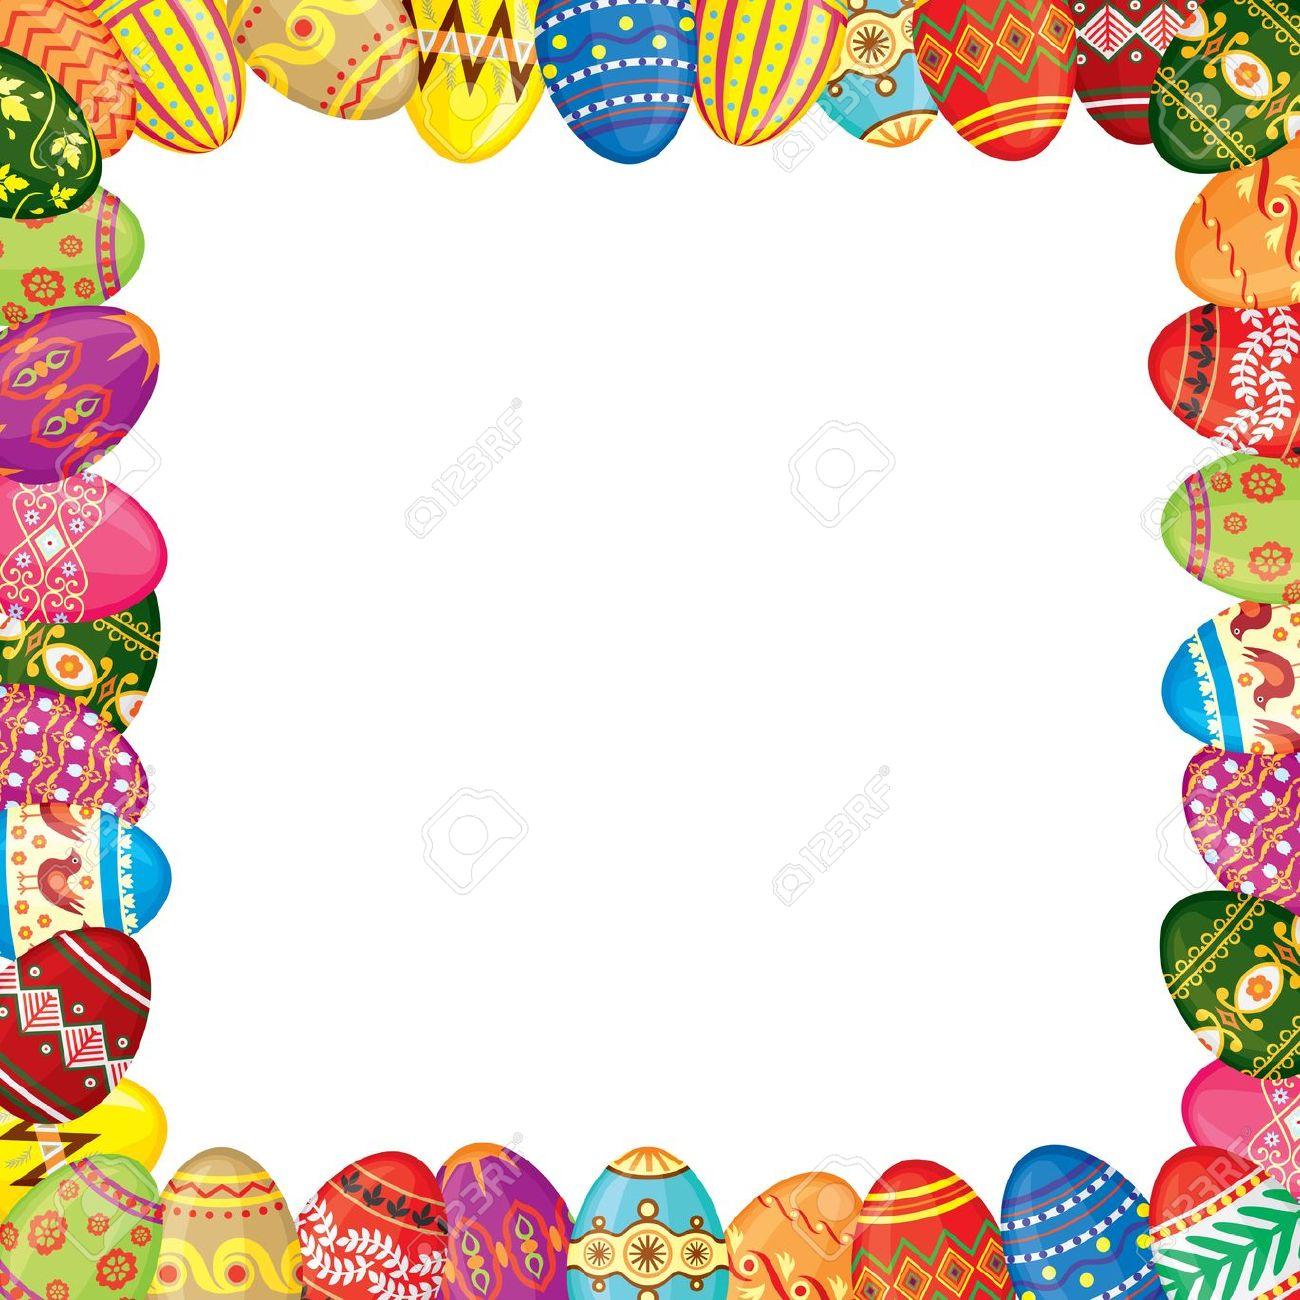 Easter clipart frames graphic transparent stock Easter clip art frame - 15 clip arts for free download on EEN graphic transparent stock